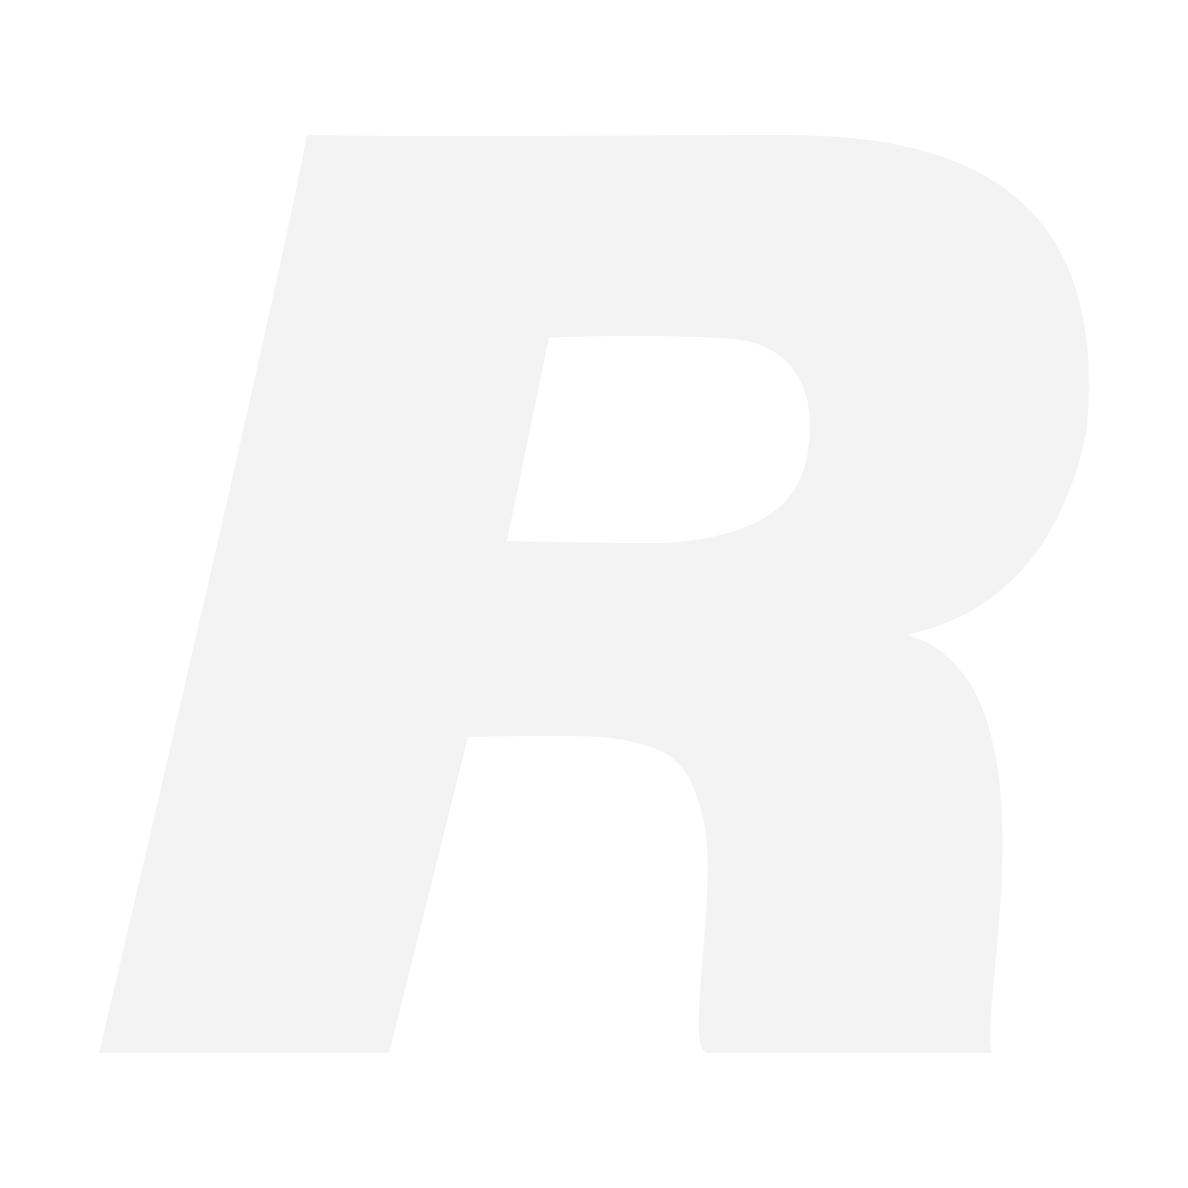 Leica Väska Twist till D-LUX, Svart Alcantara (Leica 18 822)